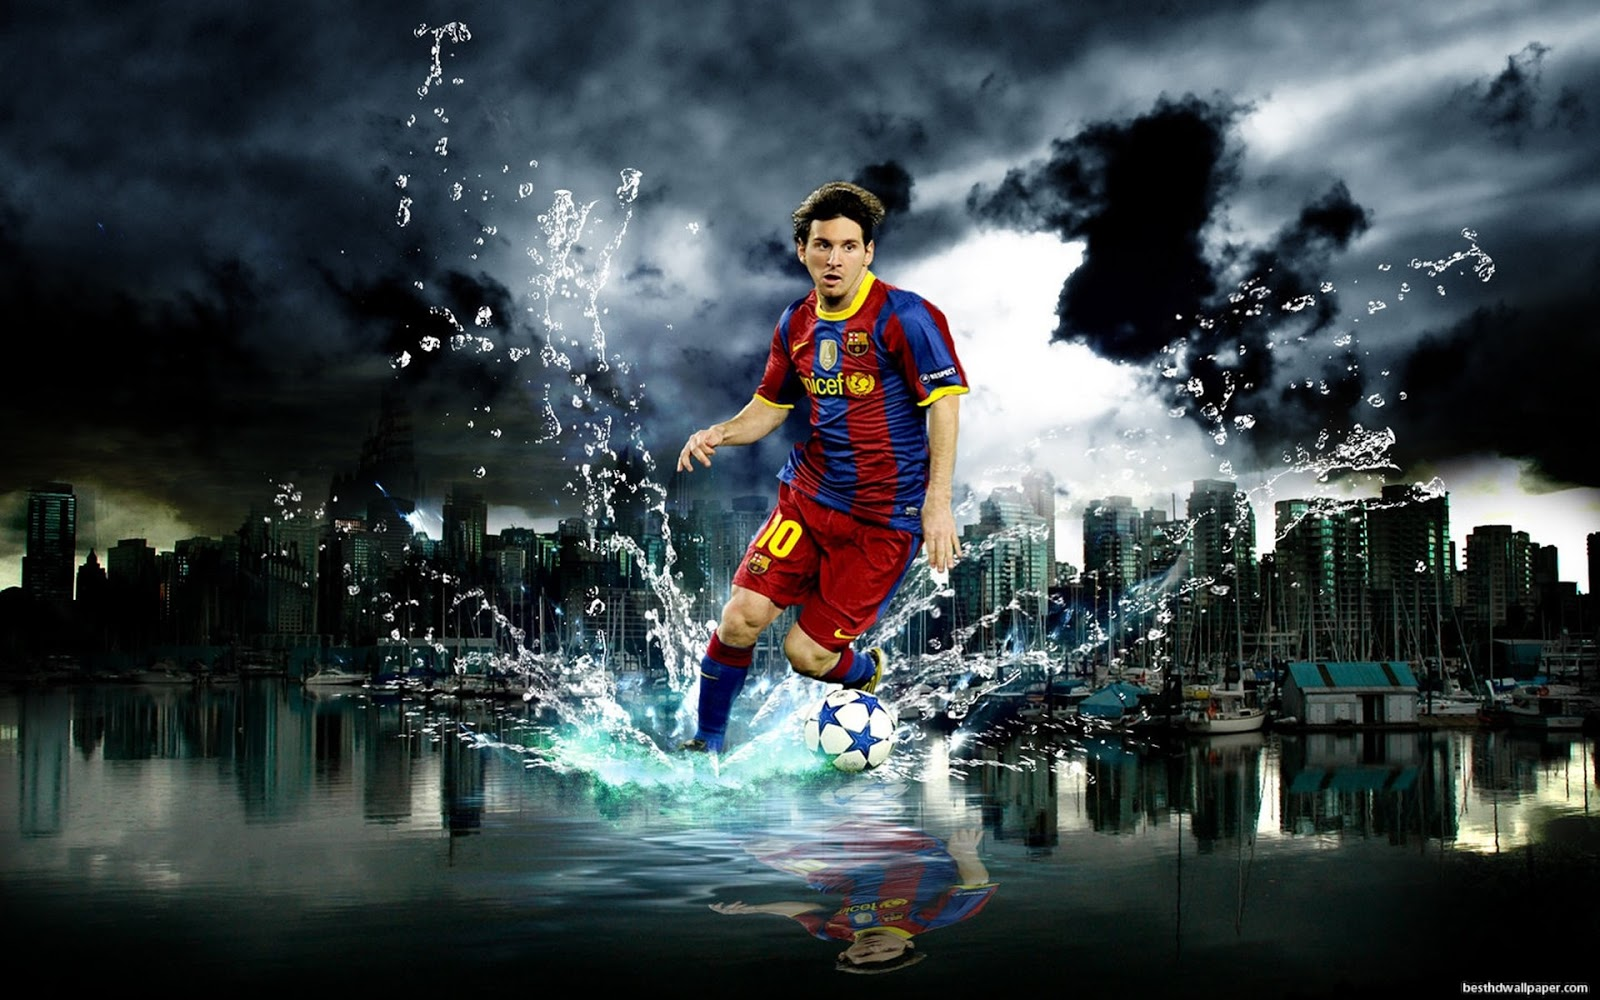 wallpapers photo photos Lionel Messi Desktop Wallpaper 2012 Full HD 1600x1000